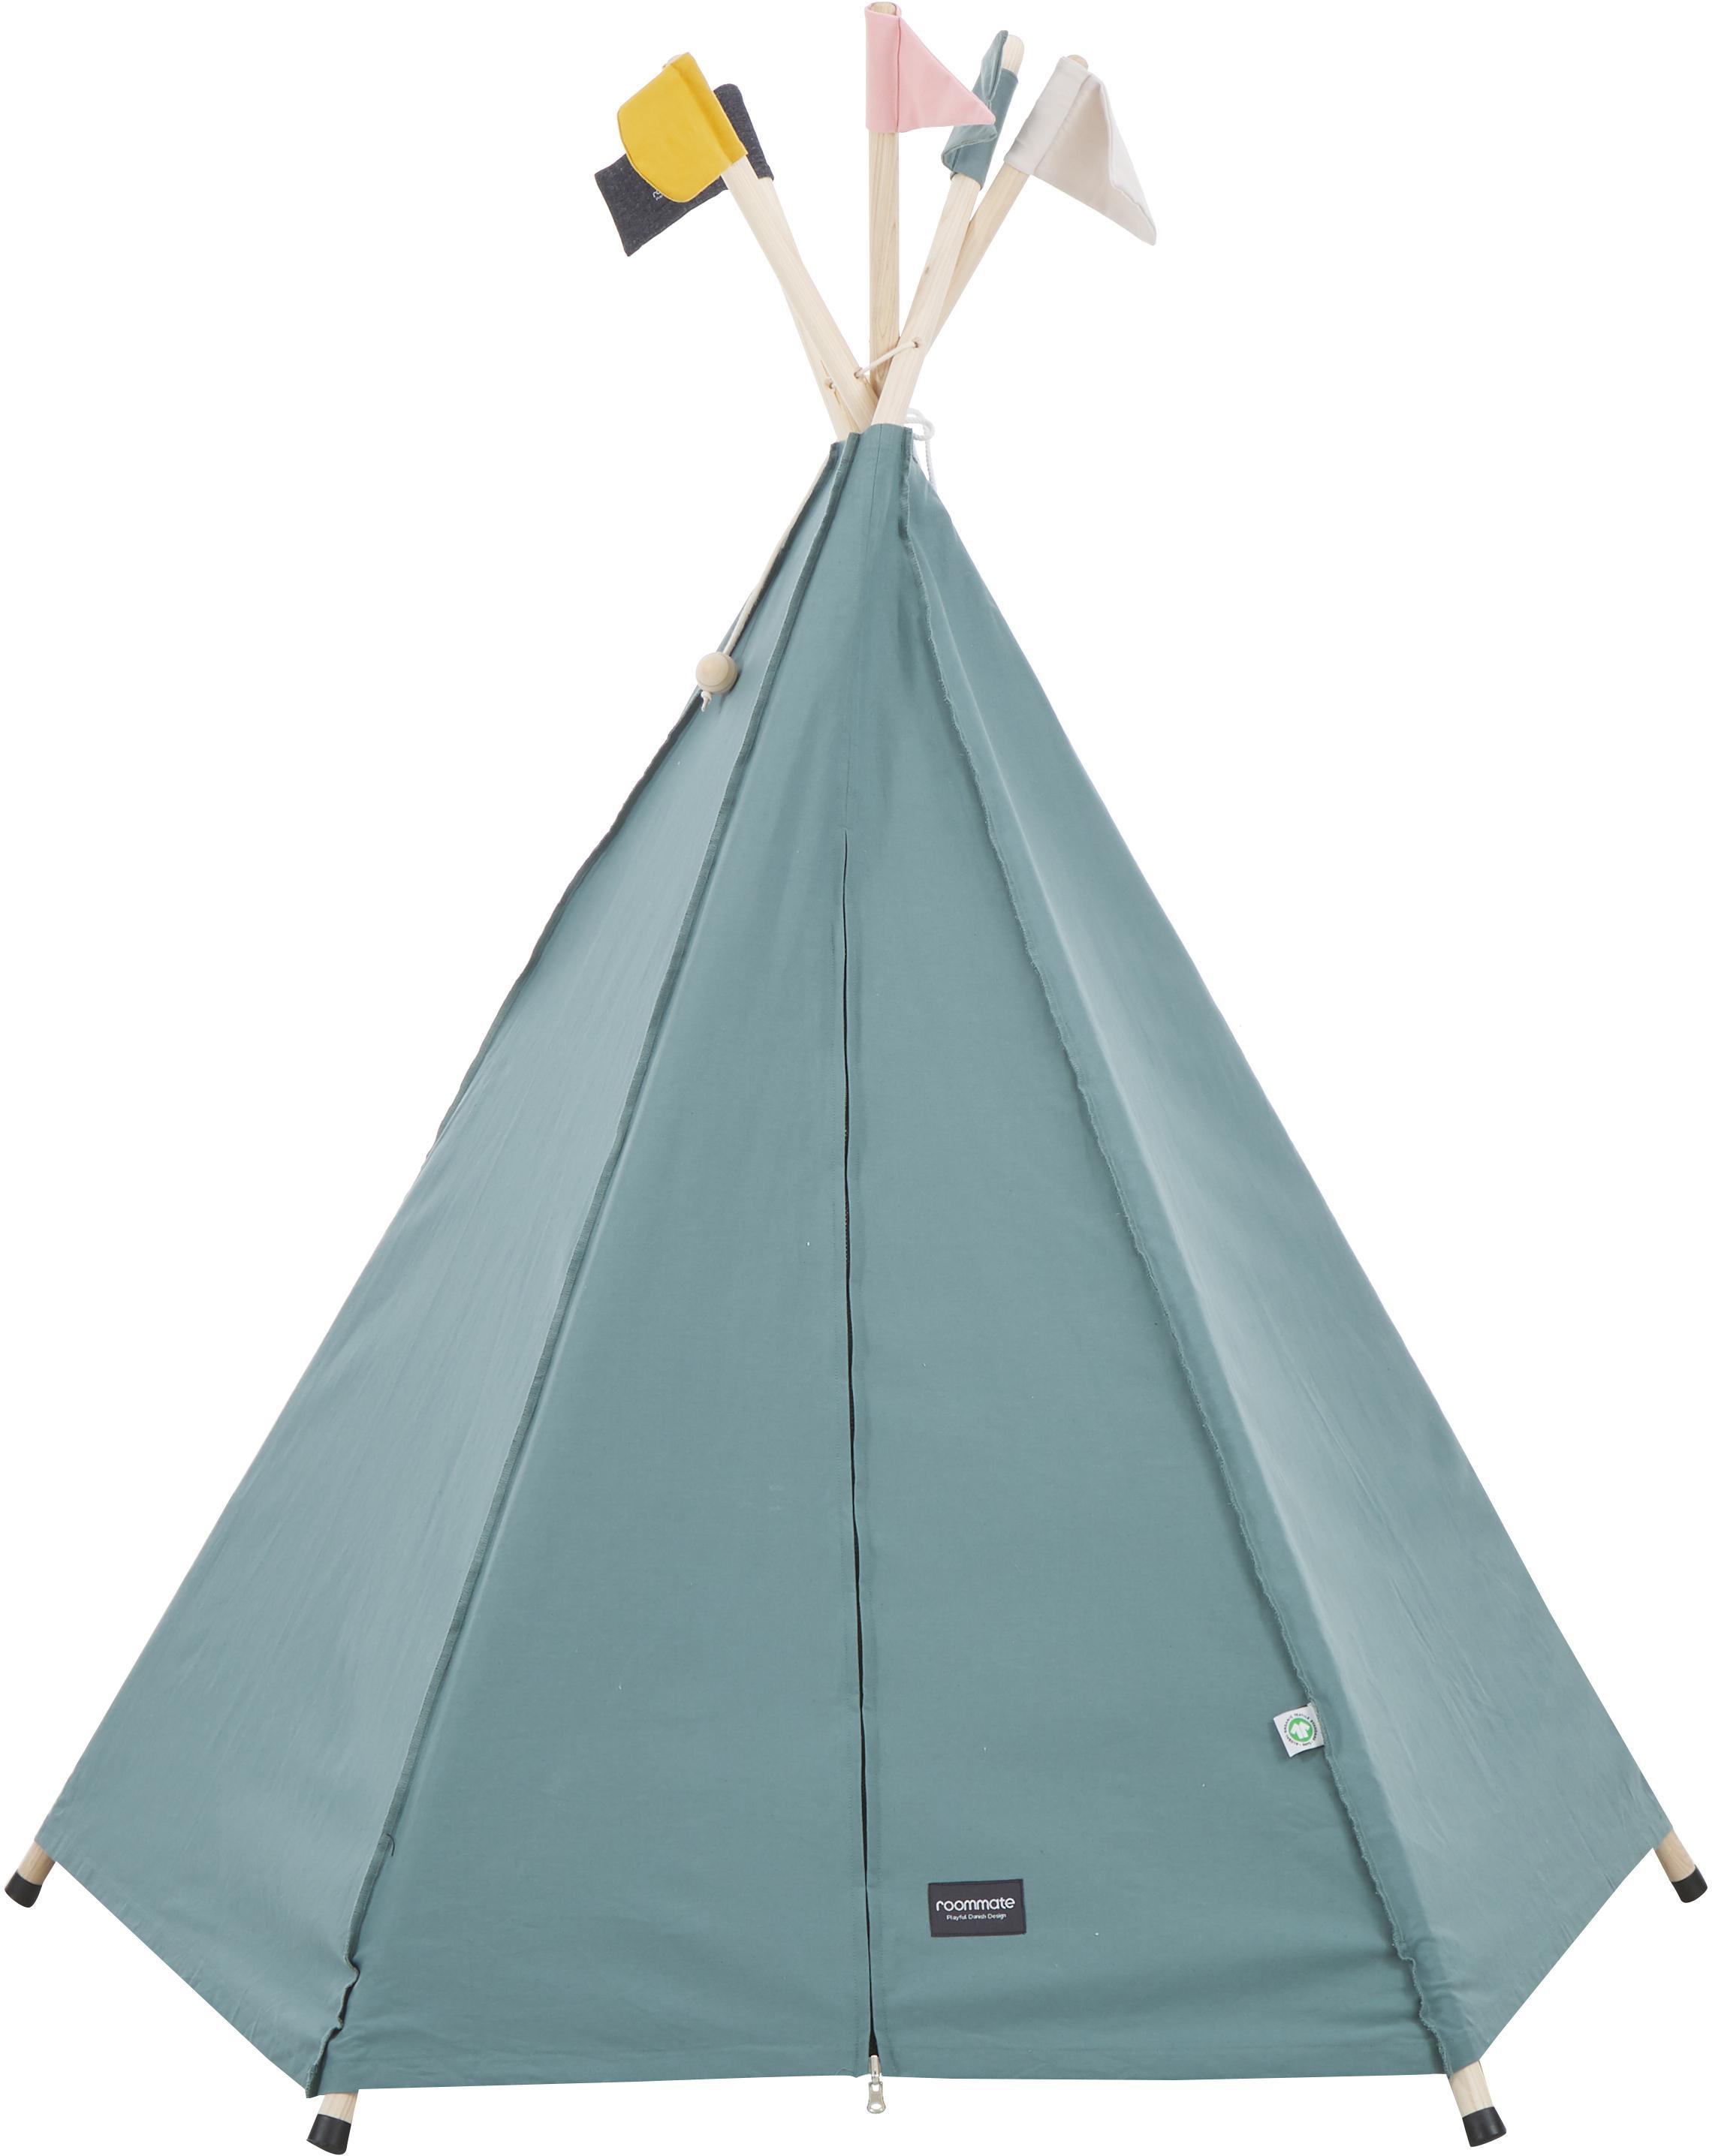 Tenda indiana teepee in cotone organico Hippie, Cotone organico, certificato GOTS, Grigio, Larg. 135 x Alt. 135 cm